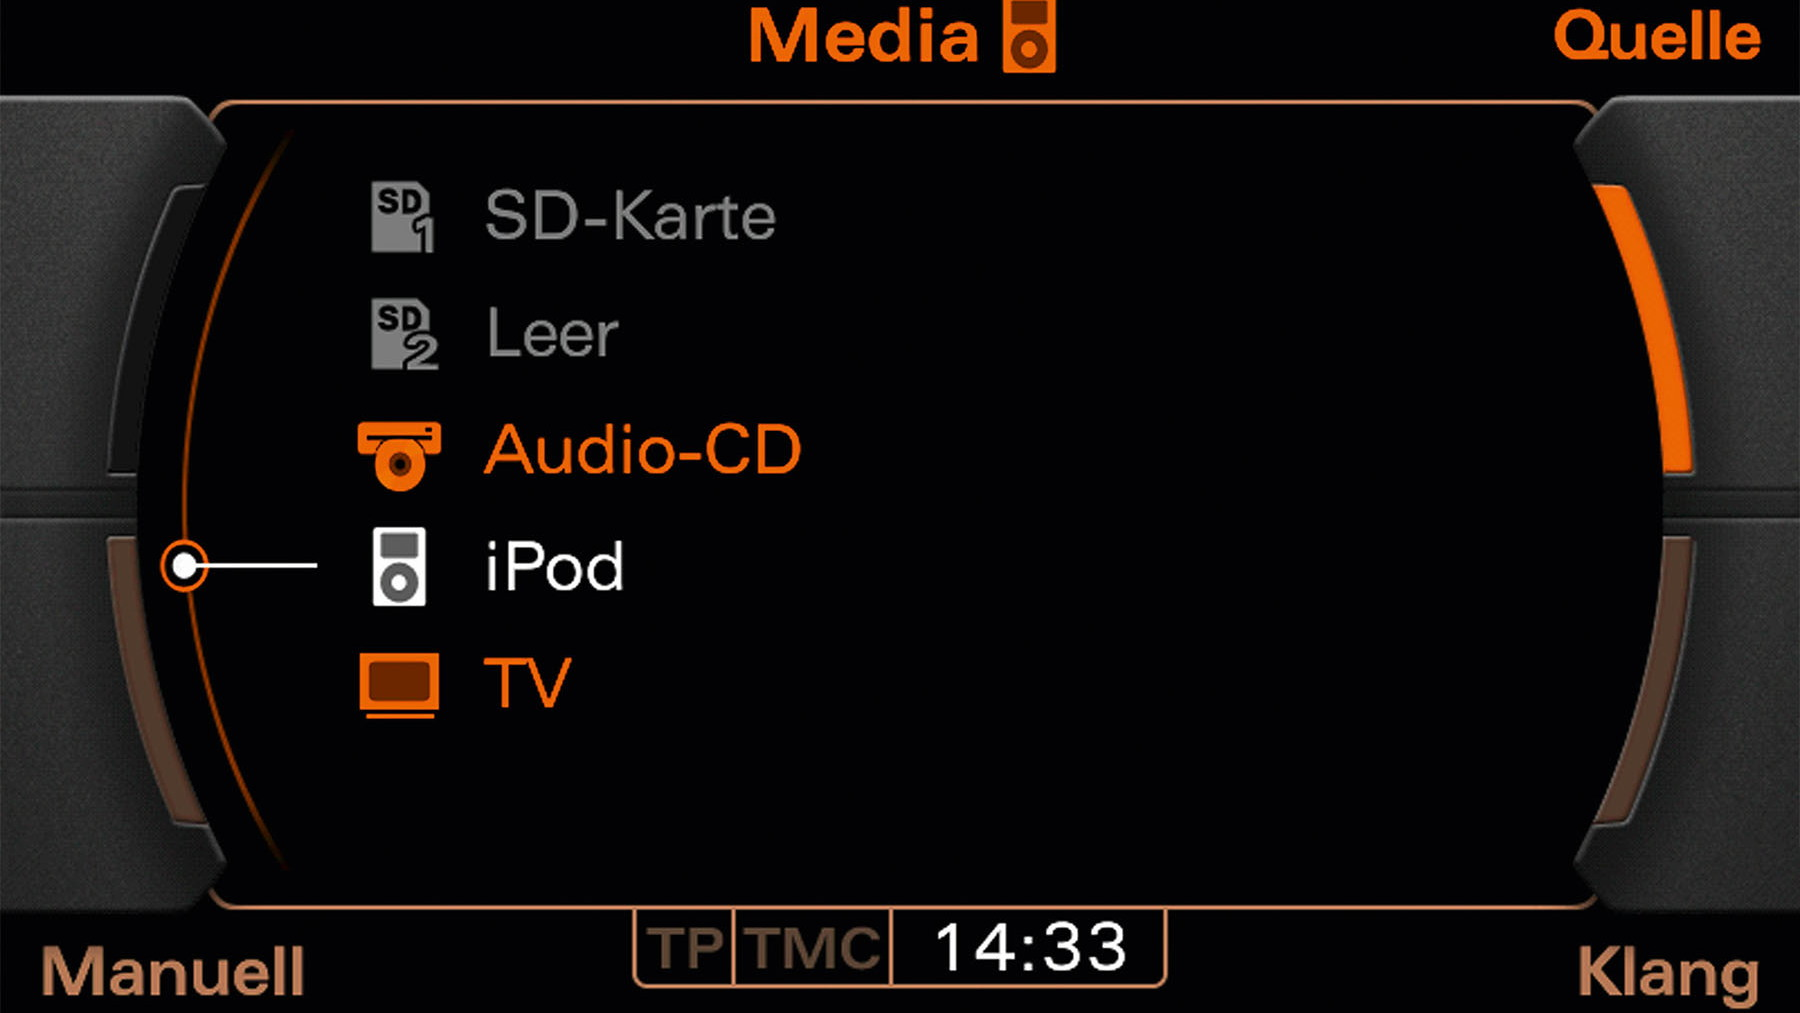 audi navigation system plus media selection 001